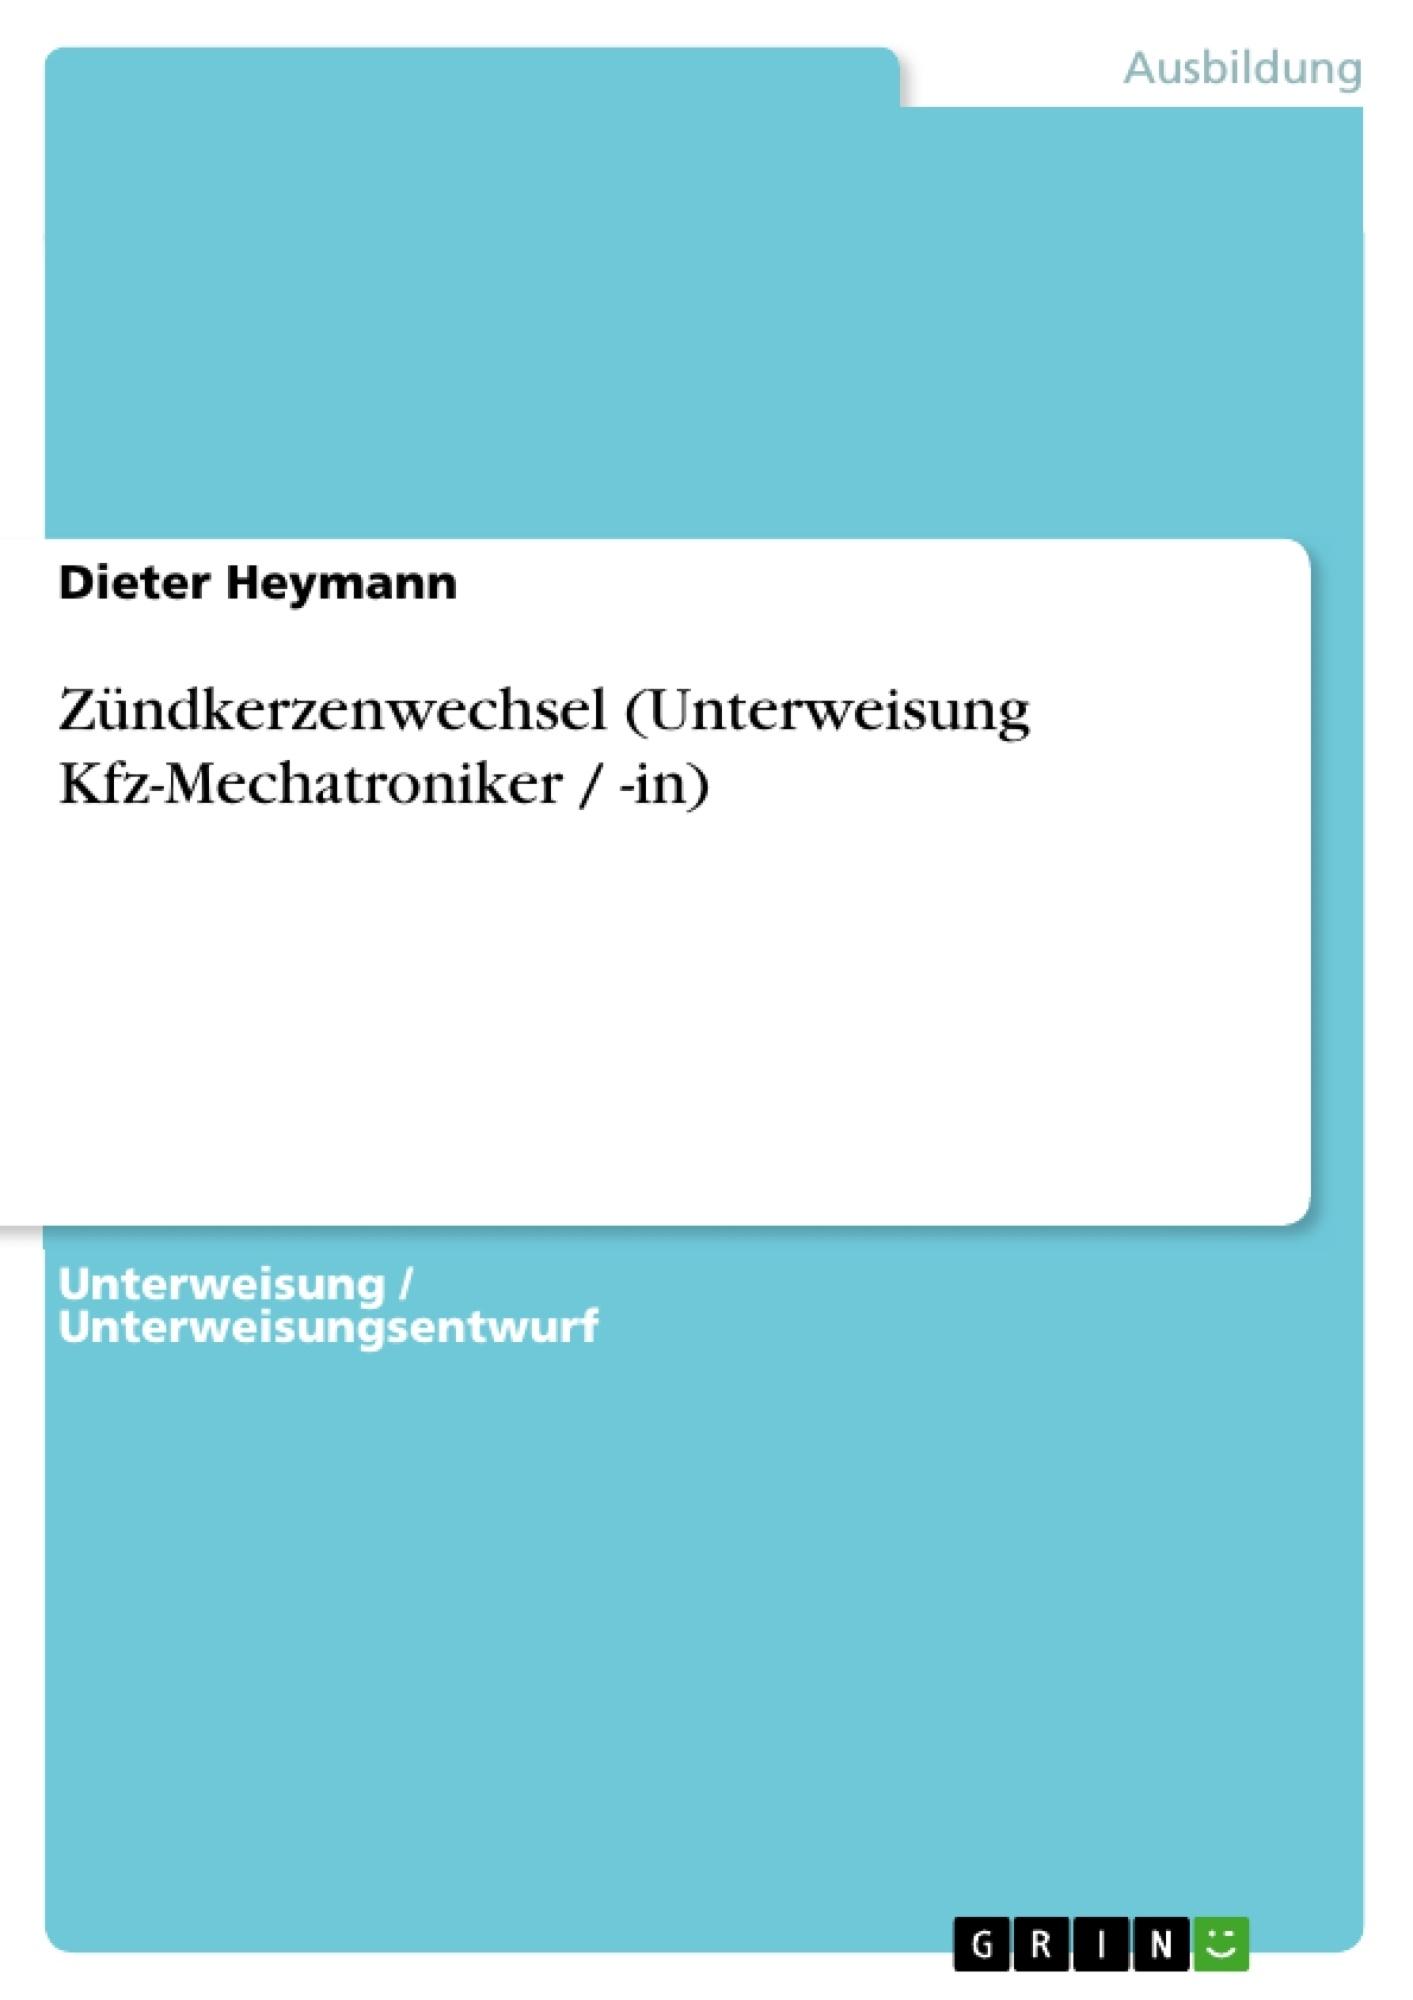 Titel: Zündkerzenwechsel (Unterweisung Kfz-Mechatroniker / -in)